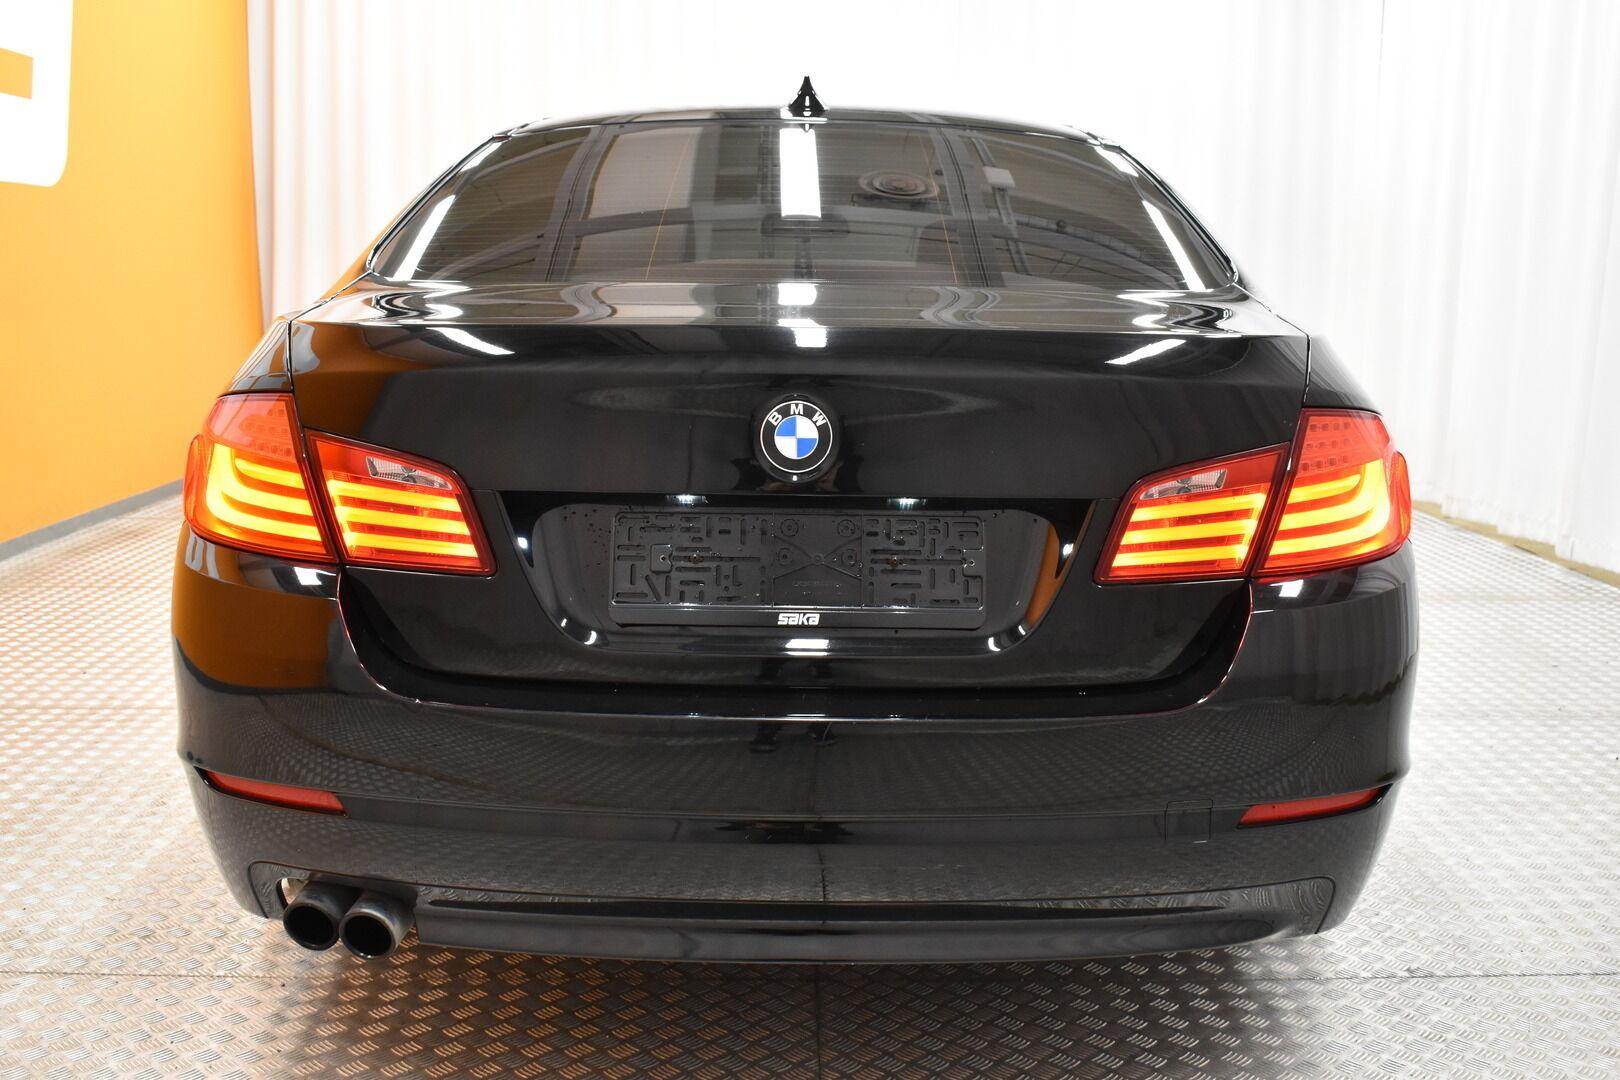 Musta Sedan, BMW 528 – POR-8128, kuva 8